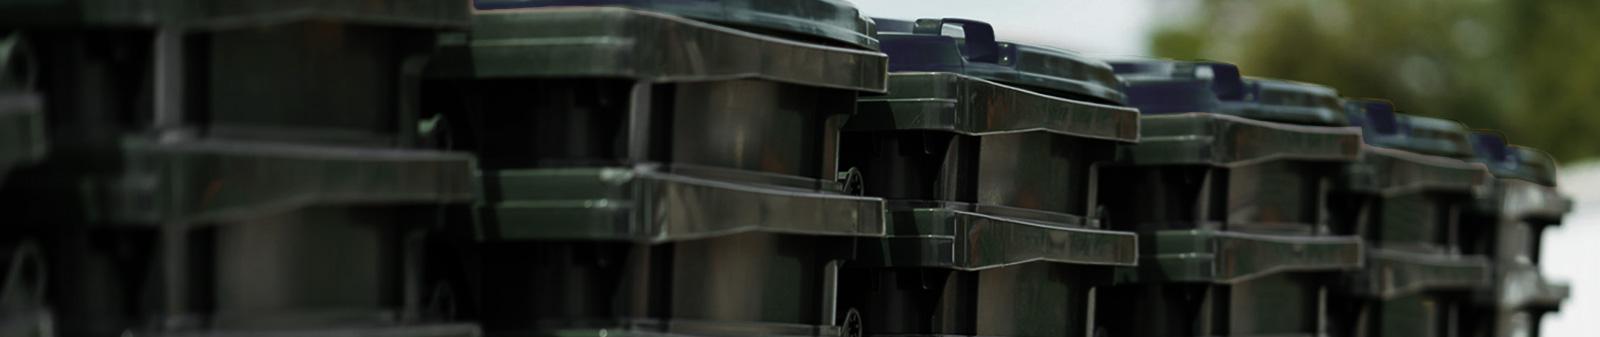 SUEZ waste streams Batteries external push